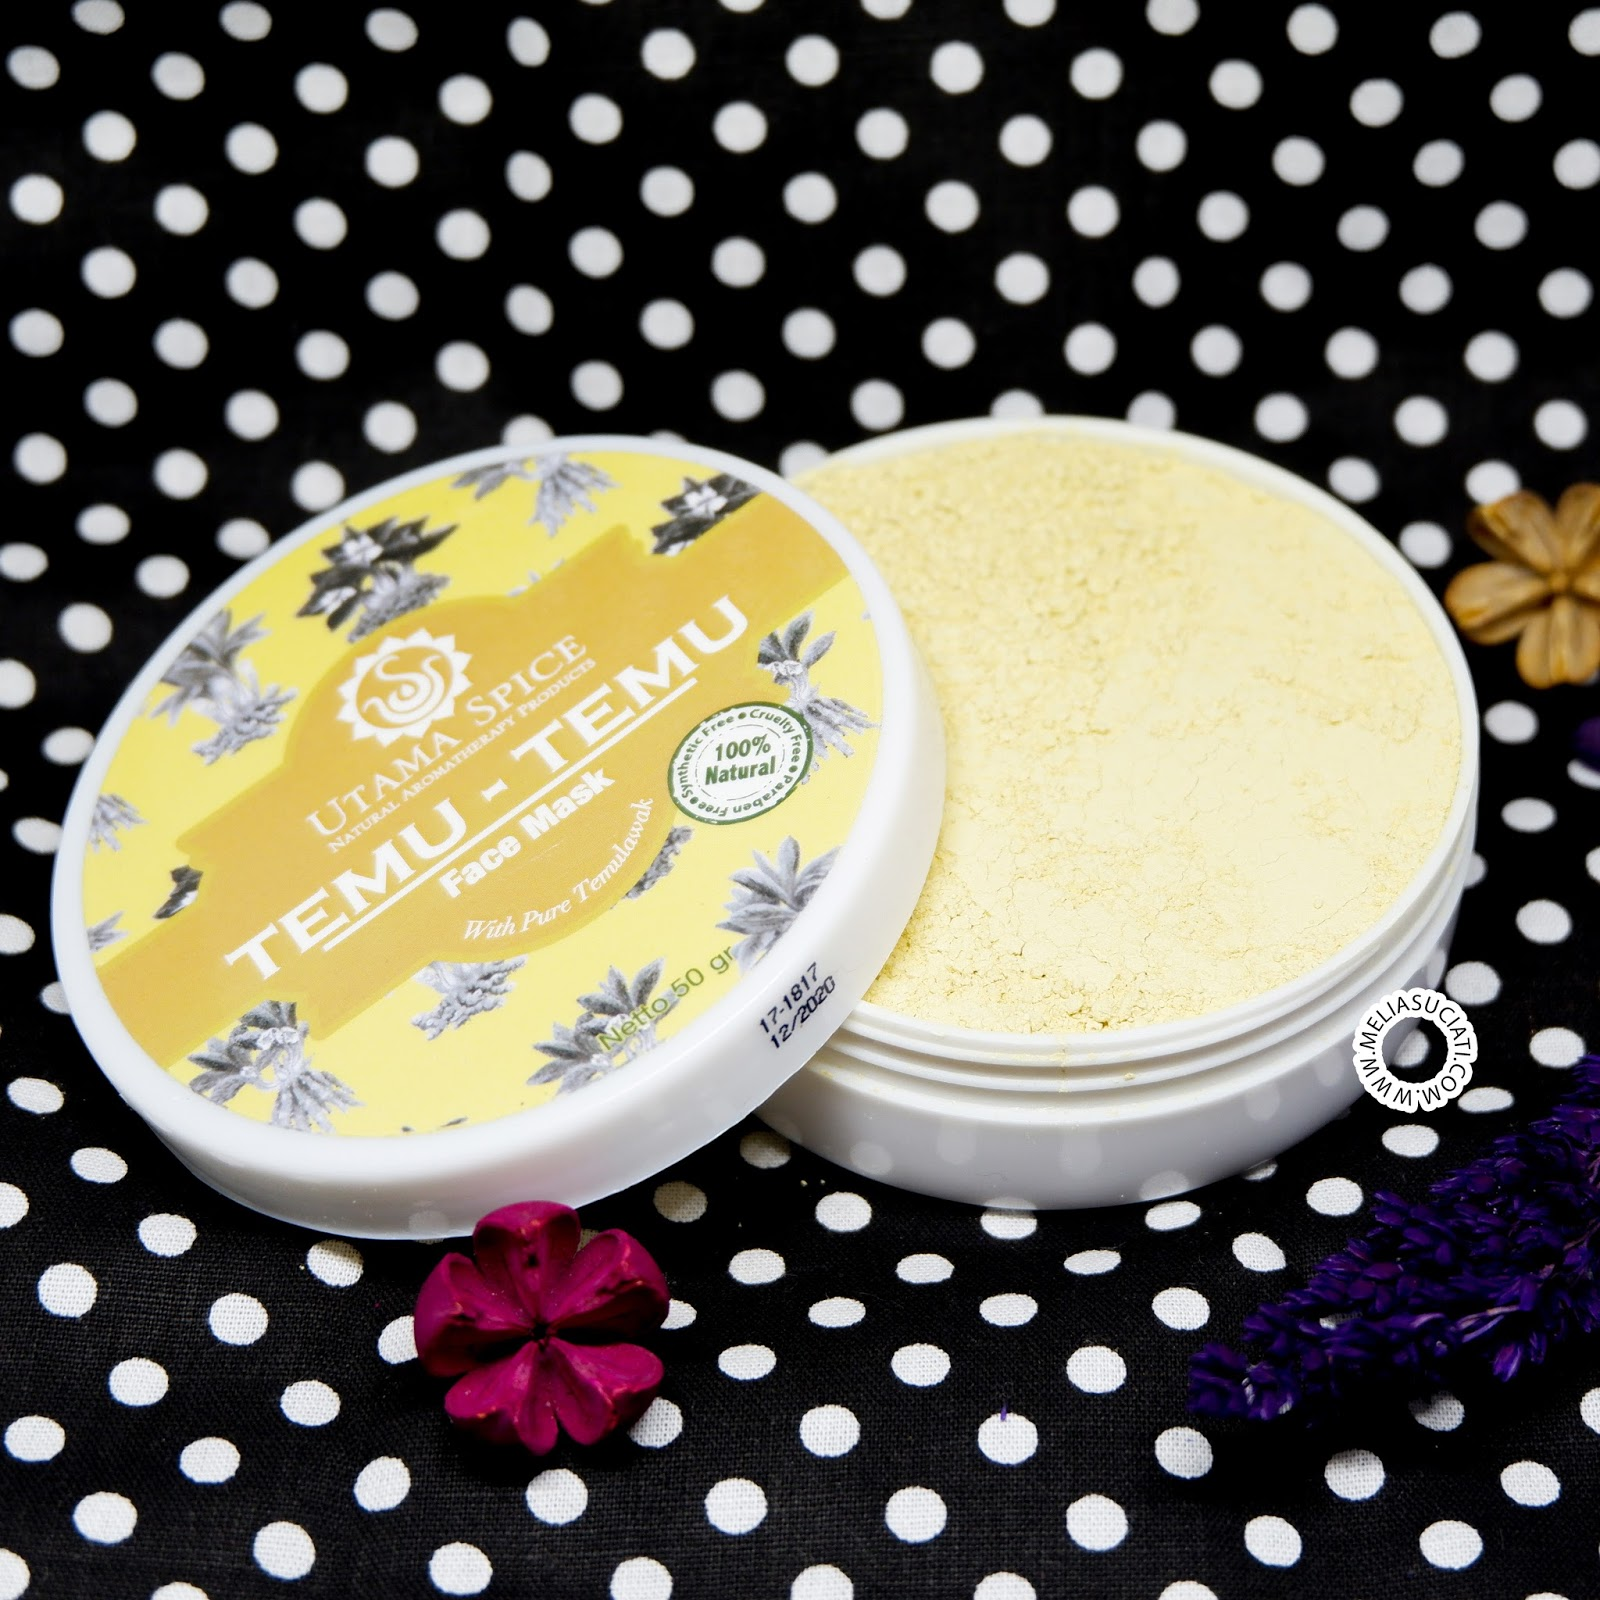 Utama Spice Traditional Skincare Based In Bali